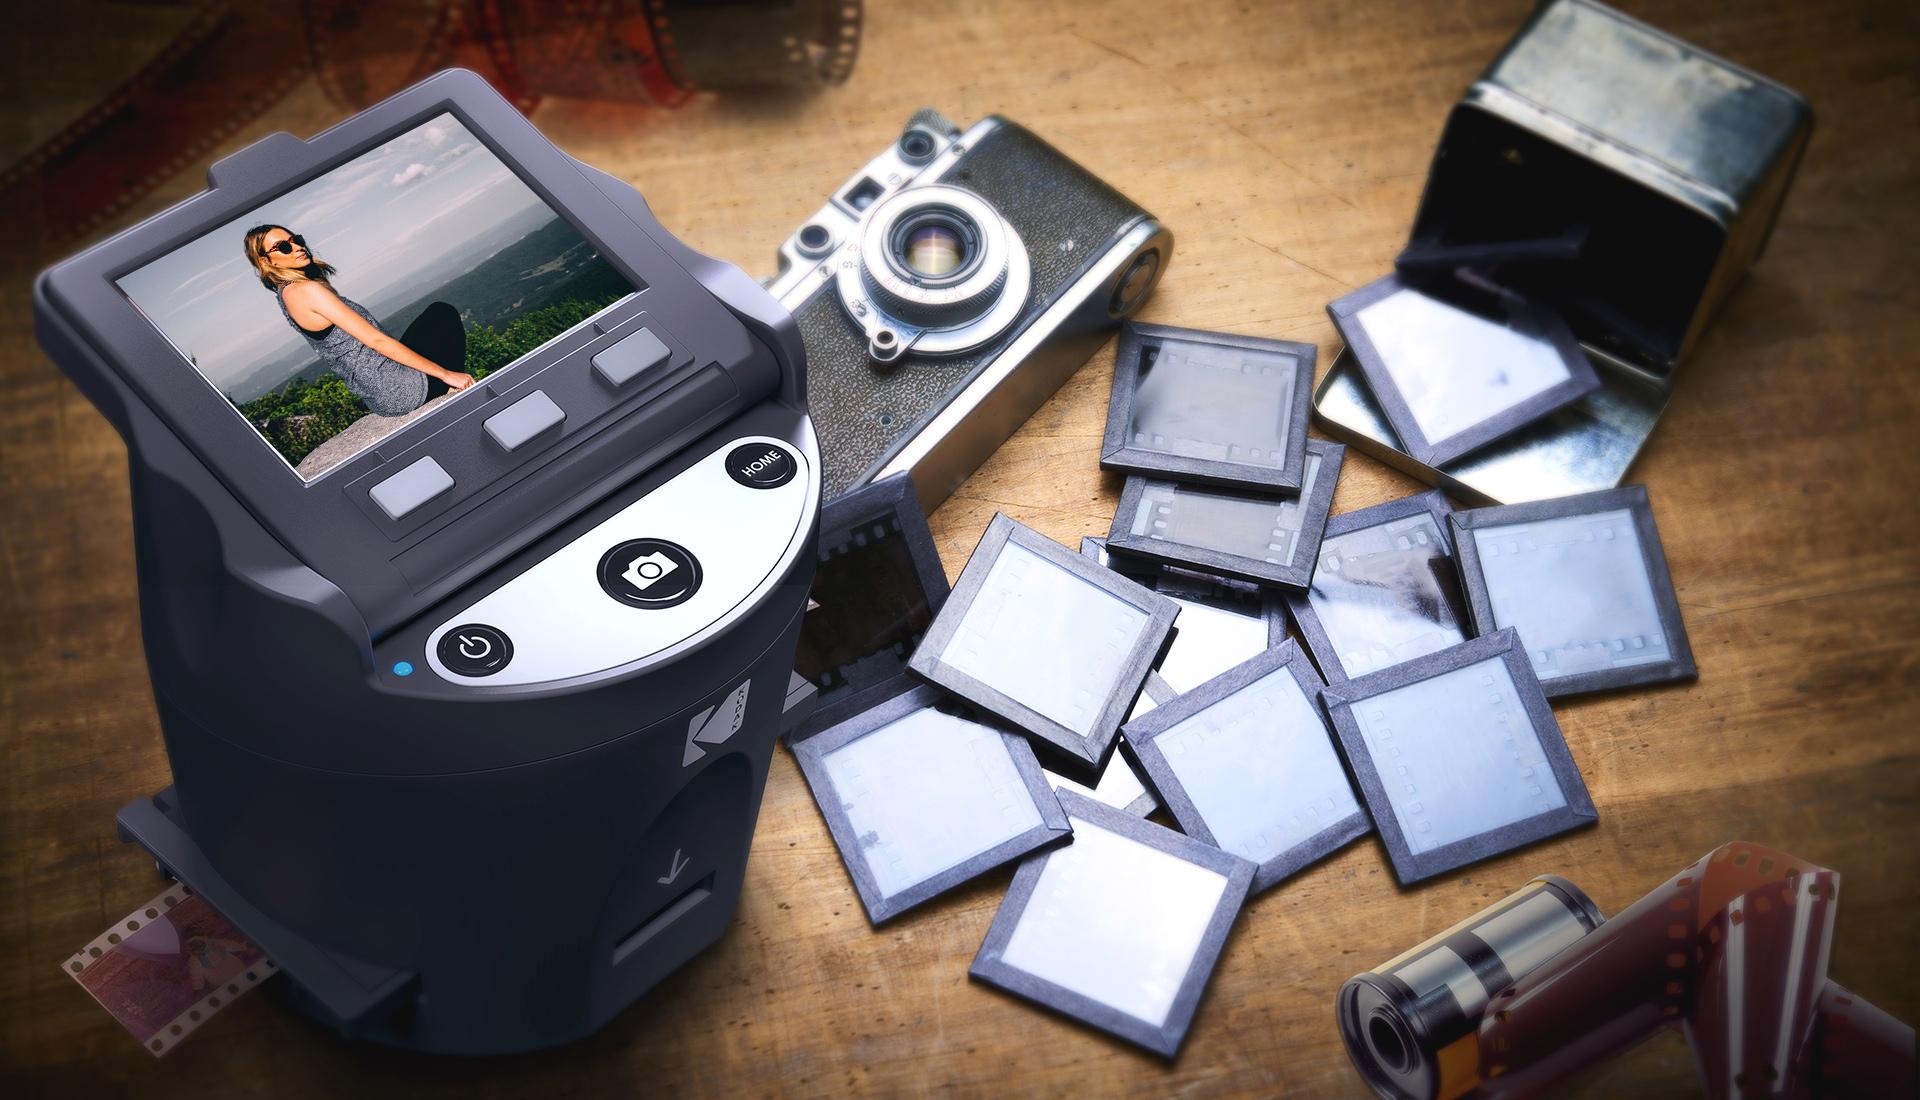 Mega Amazon deal on Kodak Scanza film scanner - just $127.99 | Digital Camera World